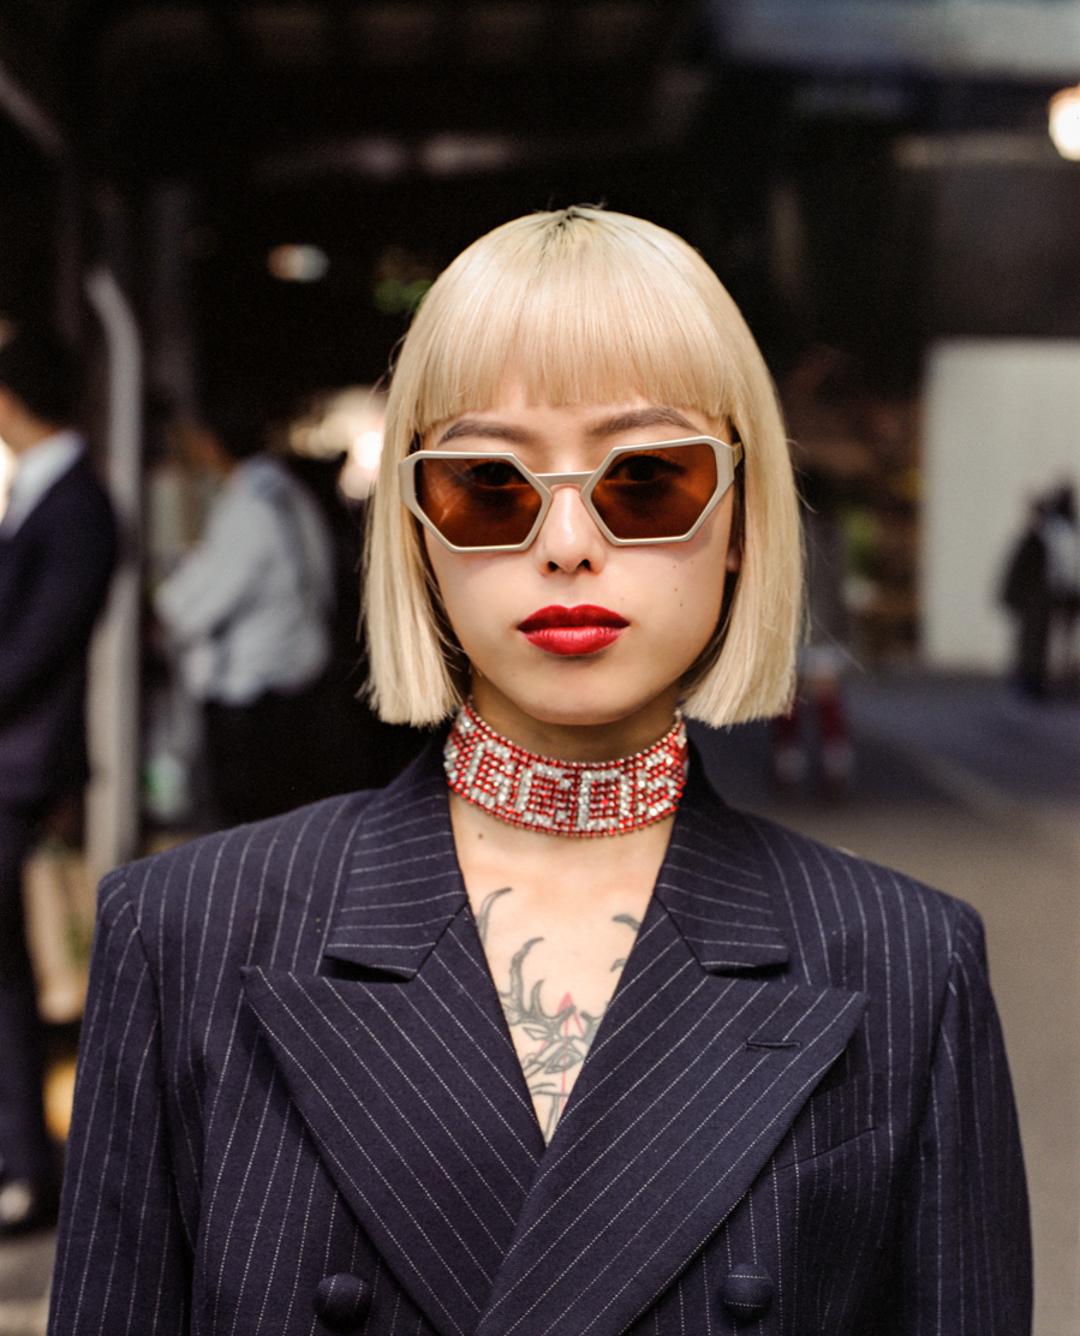 Erika wearing a double-breasted jacket and geometrical sunglasses in Shibuya